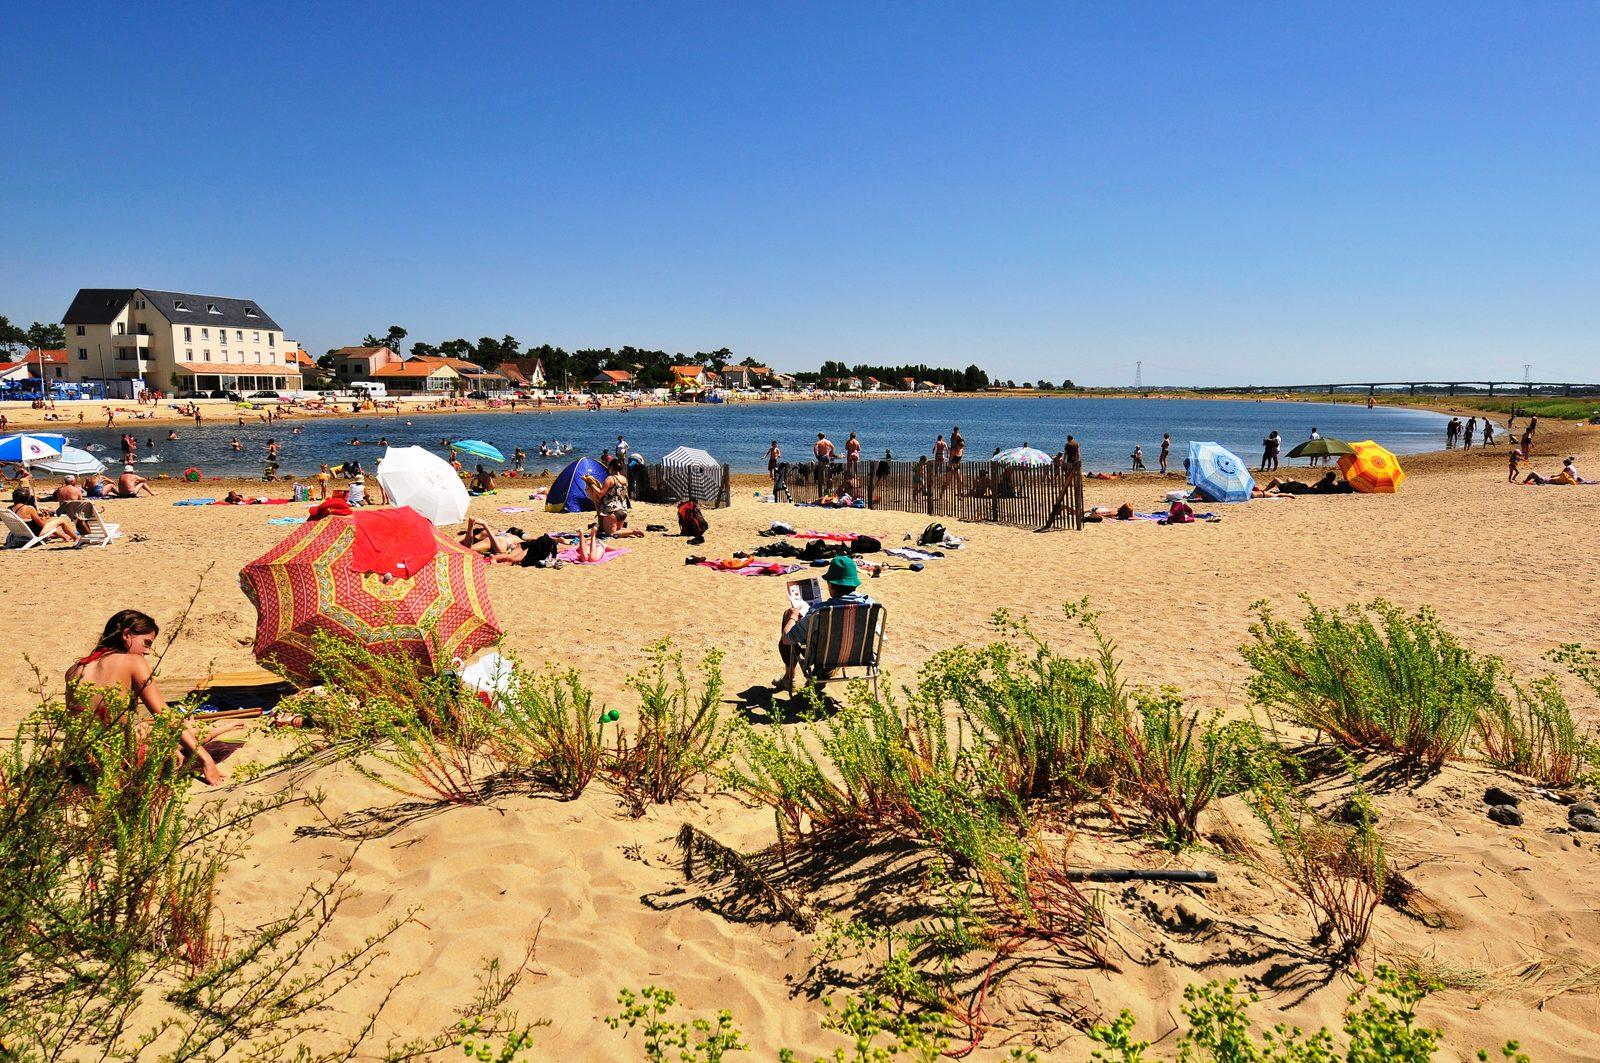 Strand van Marennes in Charente Maritime Frankrijk